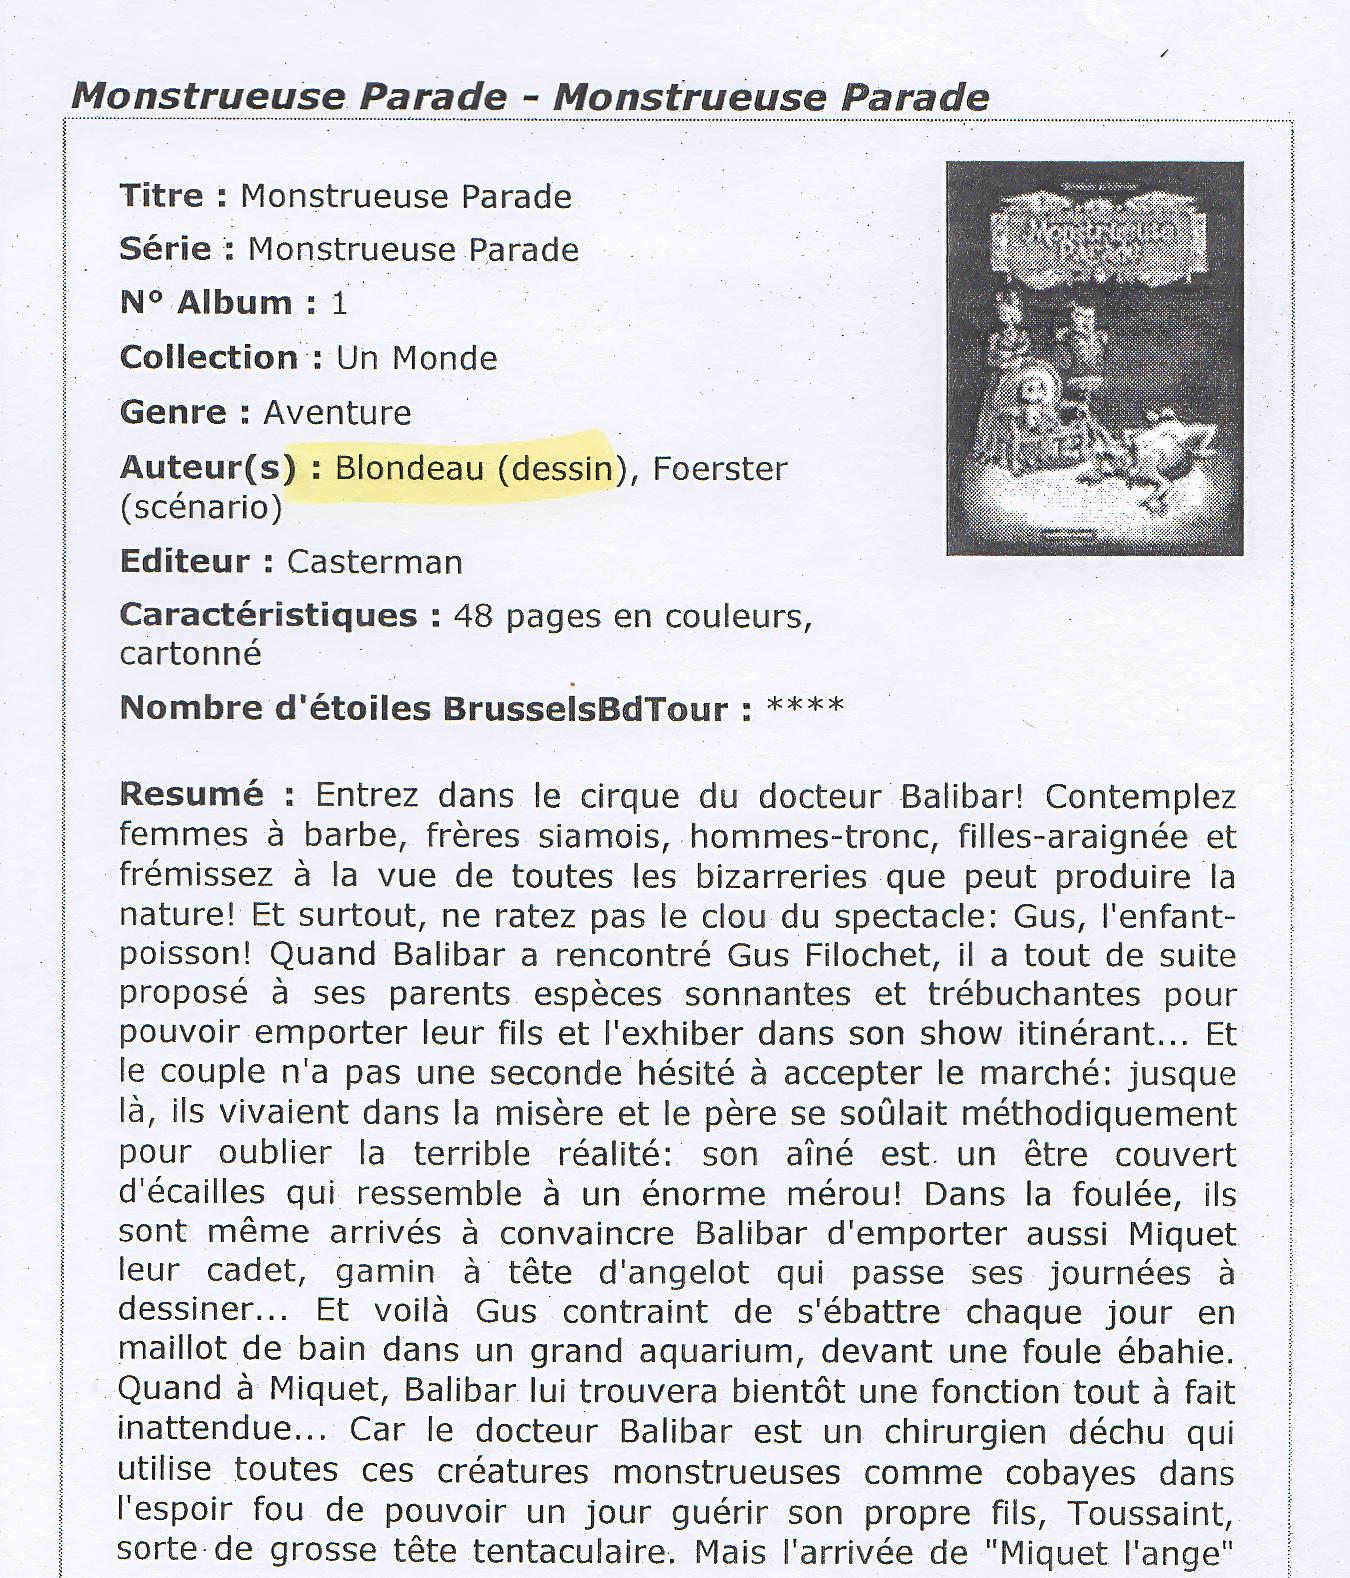 Mu Blondeau Monstrueuse Parade Philippe Foerster BrusselsBDtours1